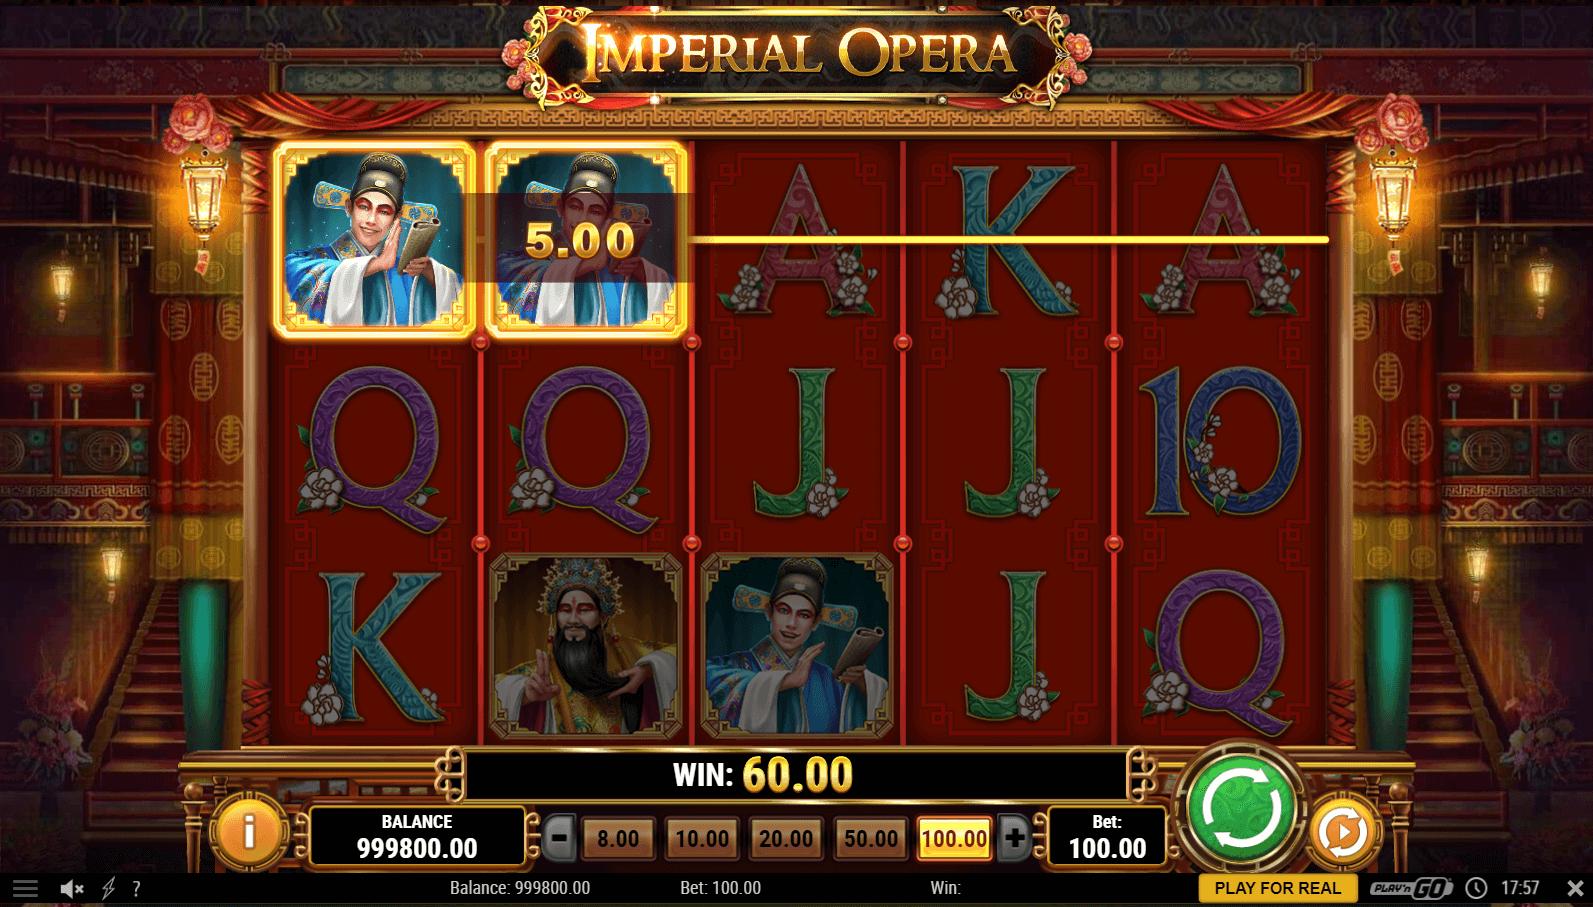 Imperial Opera Slot Machine